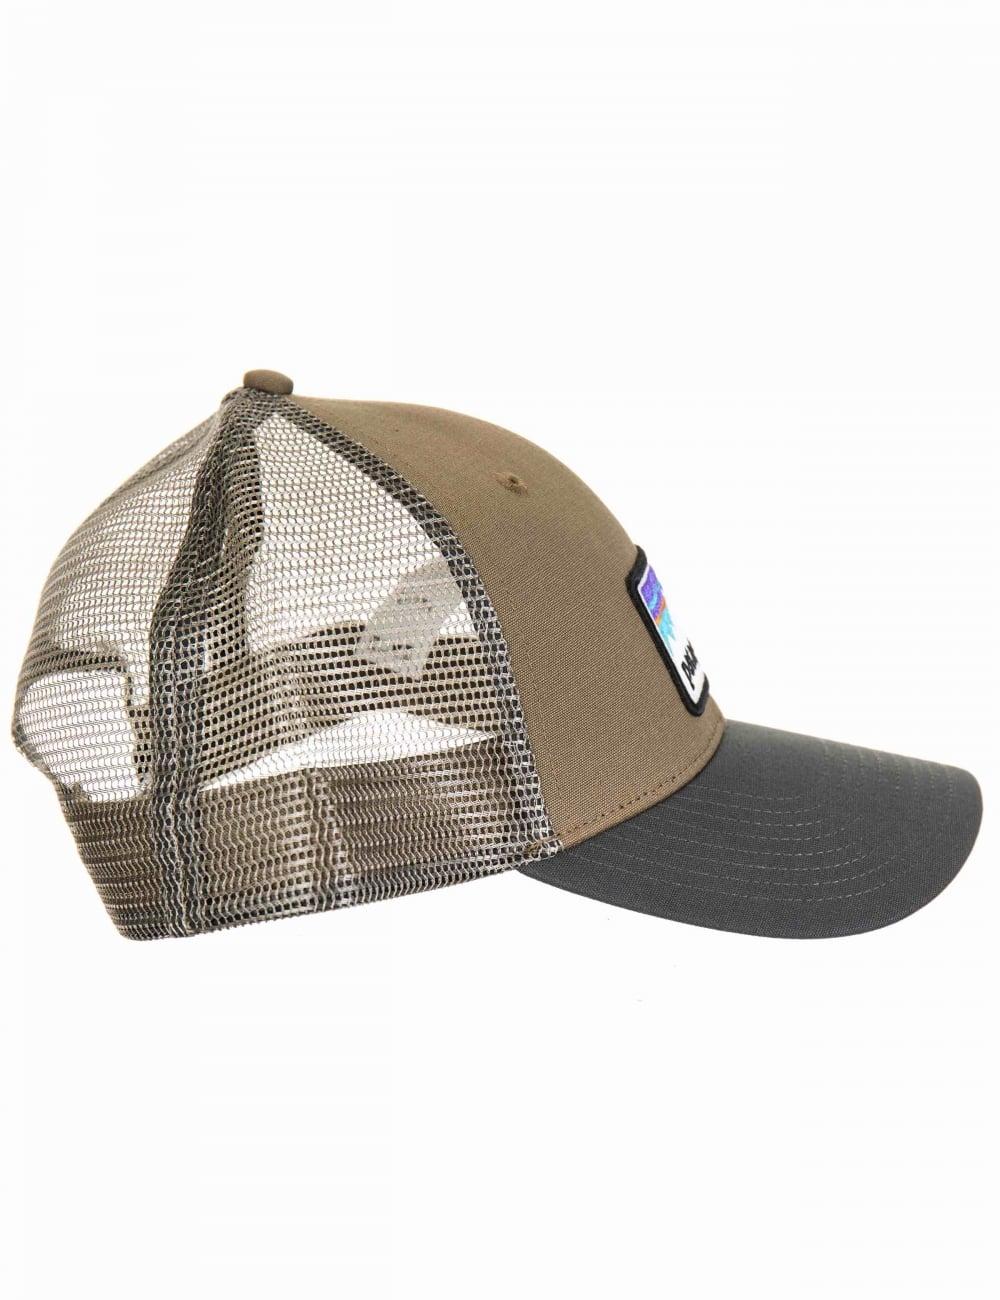 226a83c0a03560 Patagonia Shop Sticker Patch LoPro Trucker Hat - Dark Ash ...